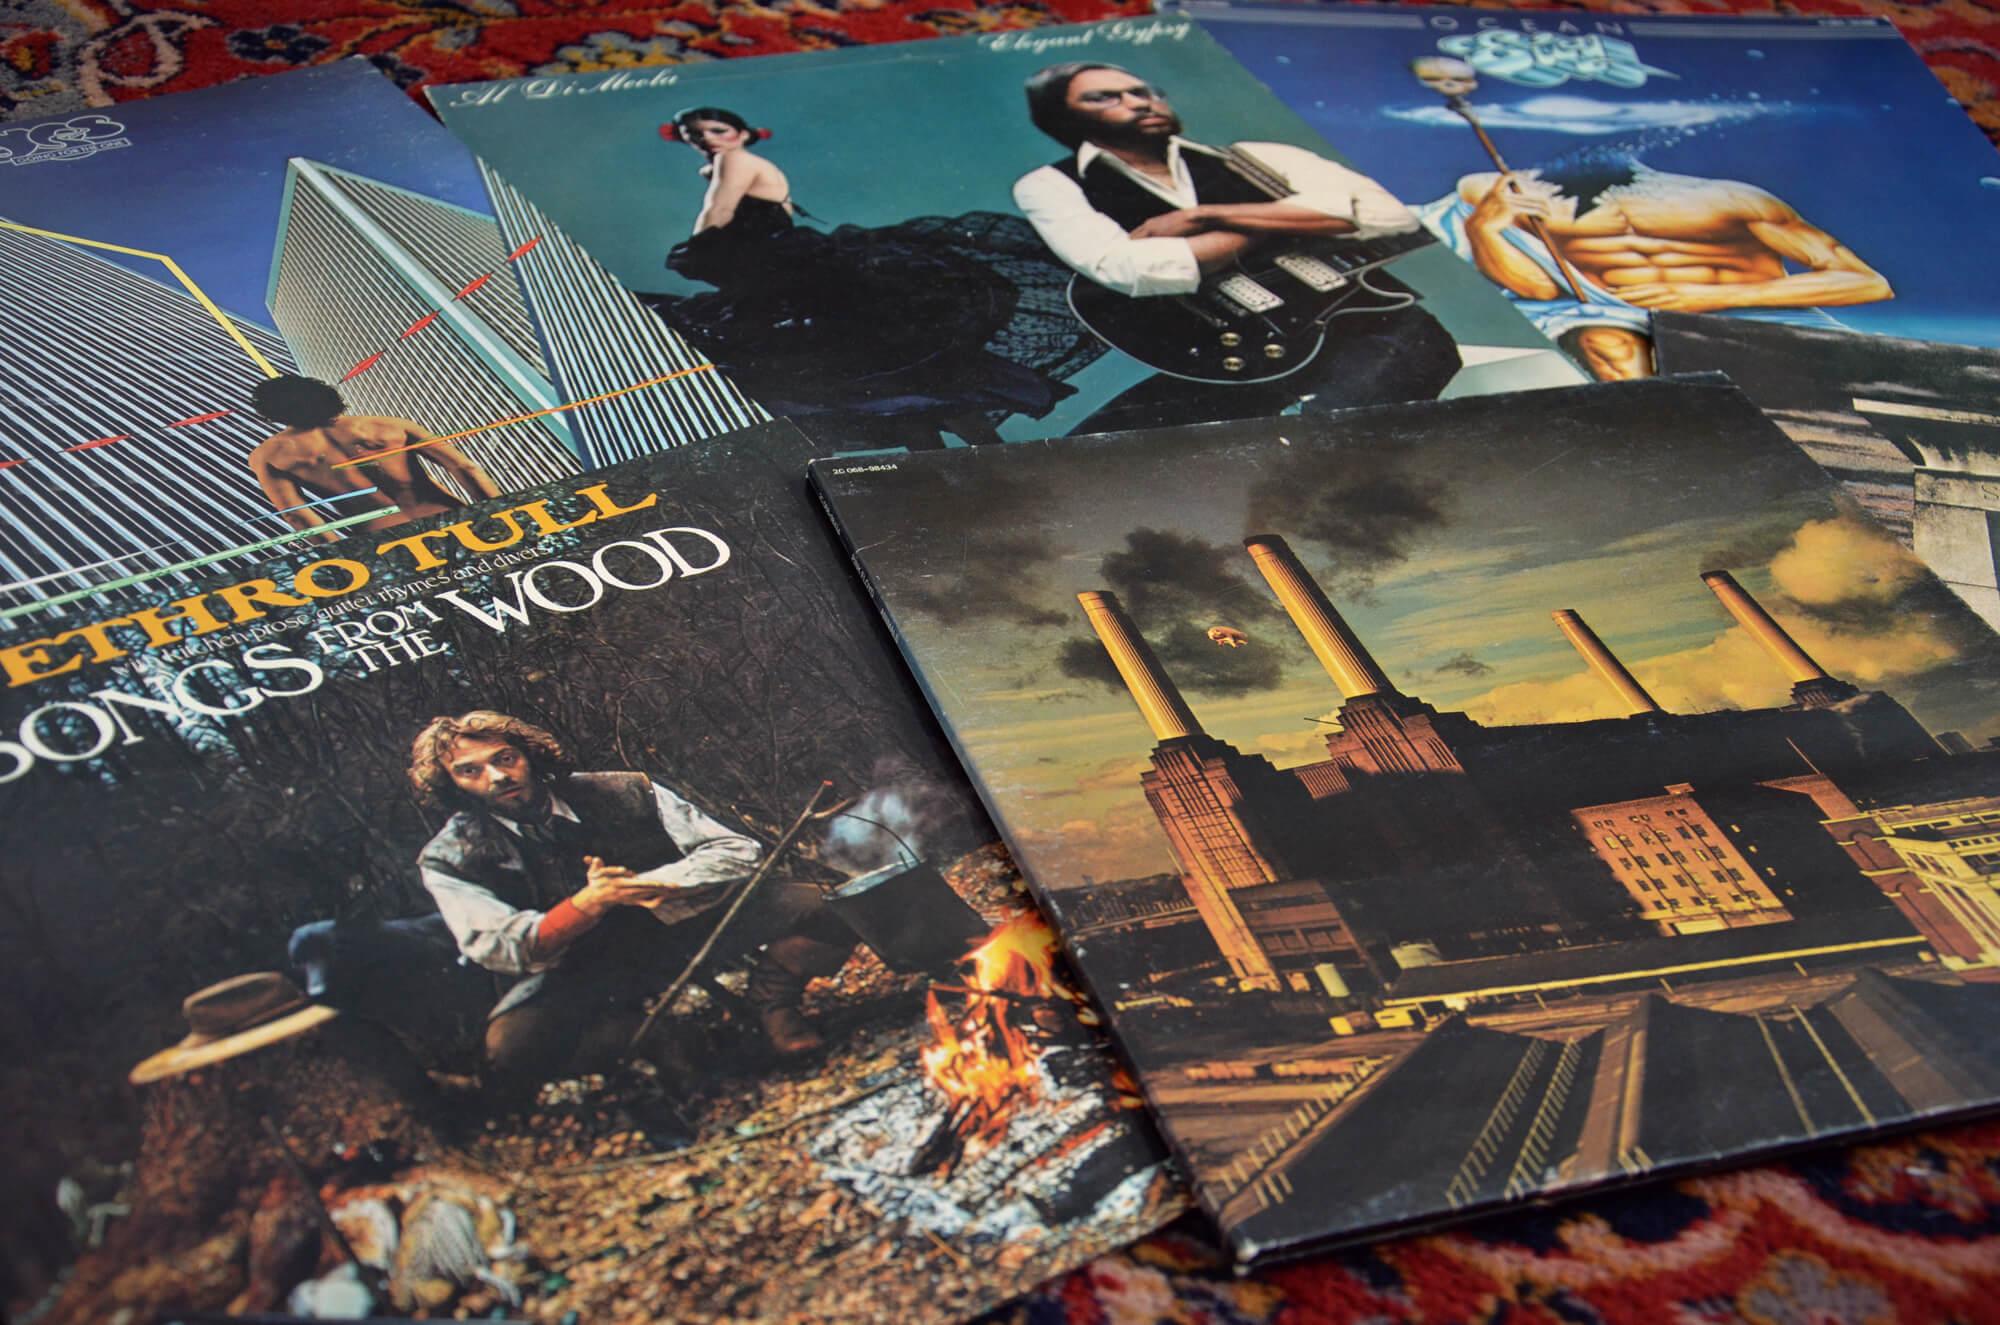 1977 - Mes 10 albums cultes